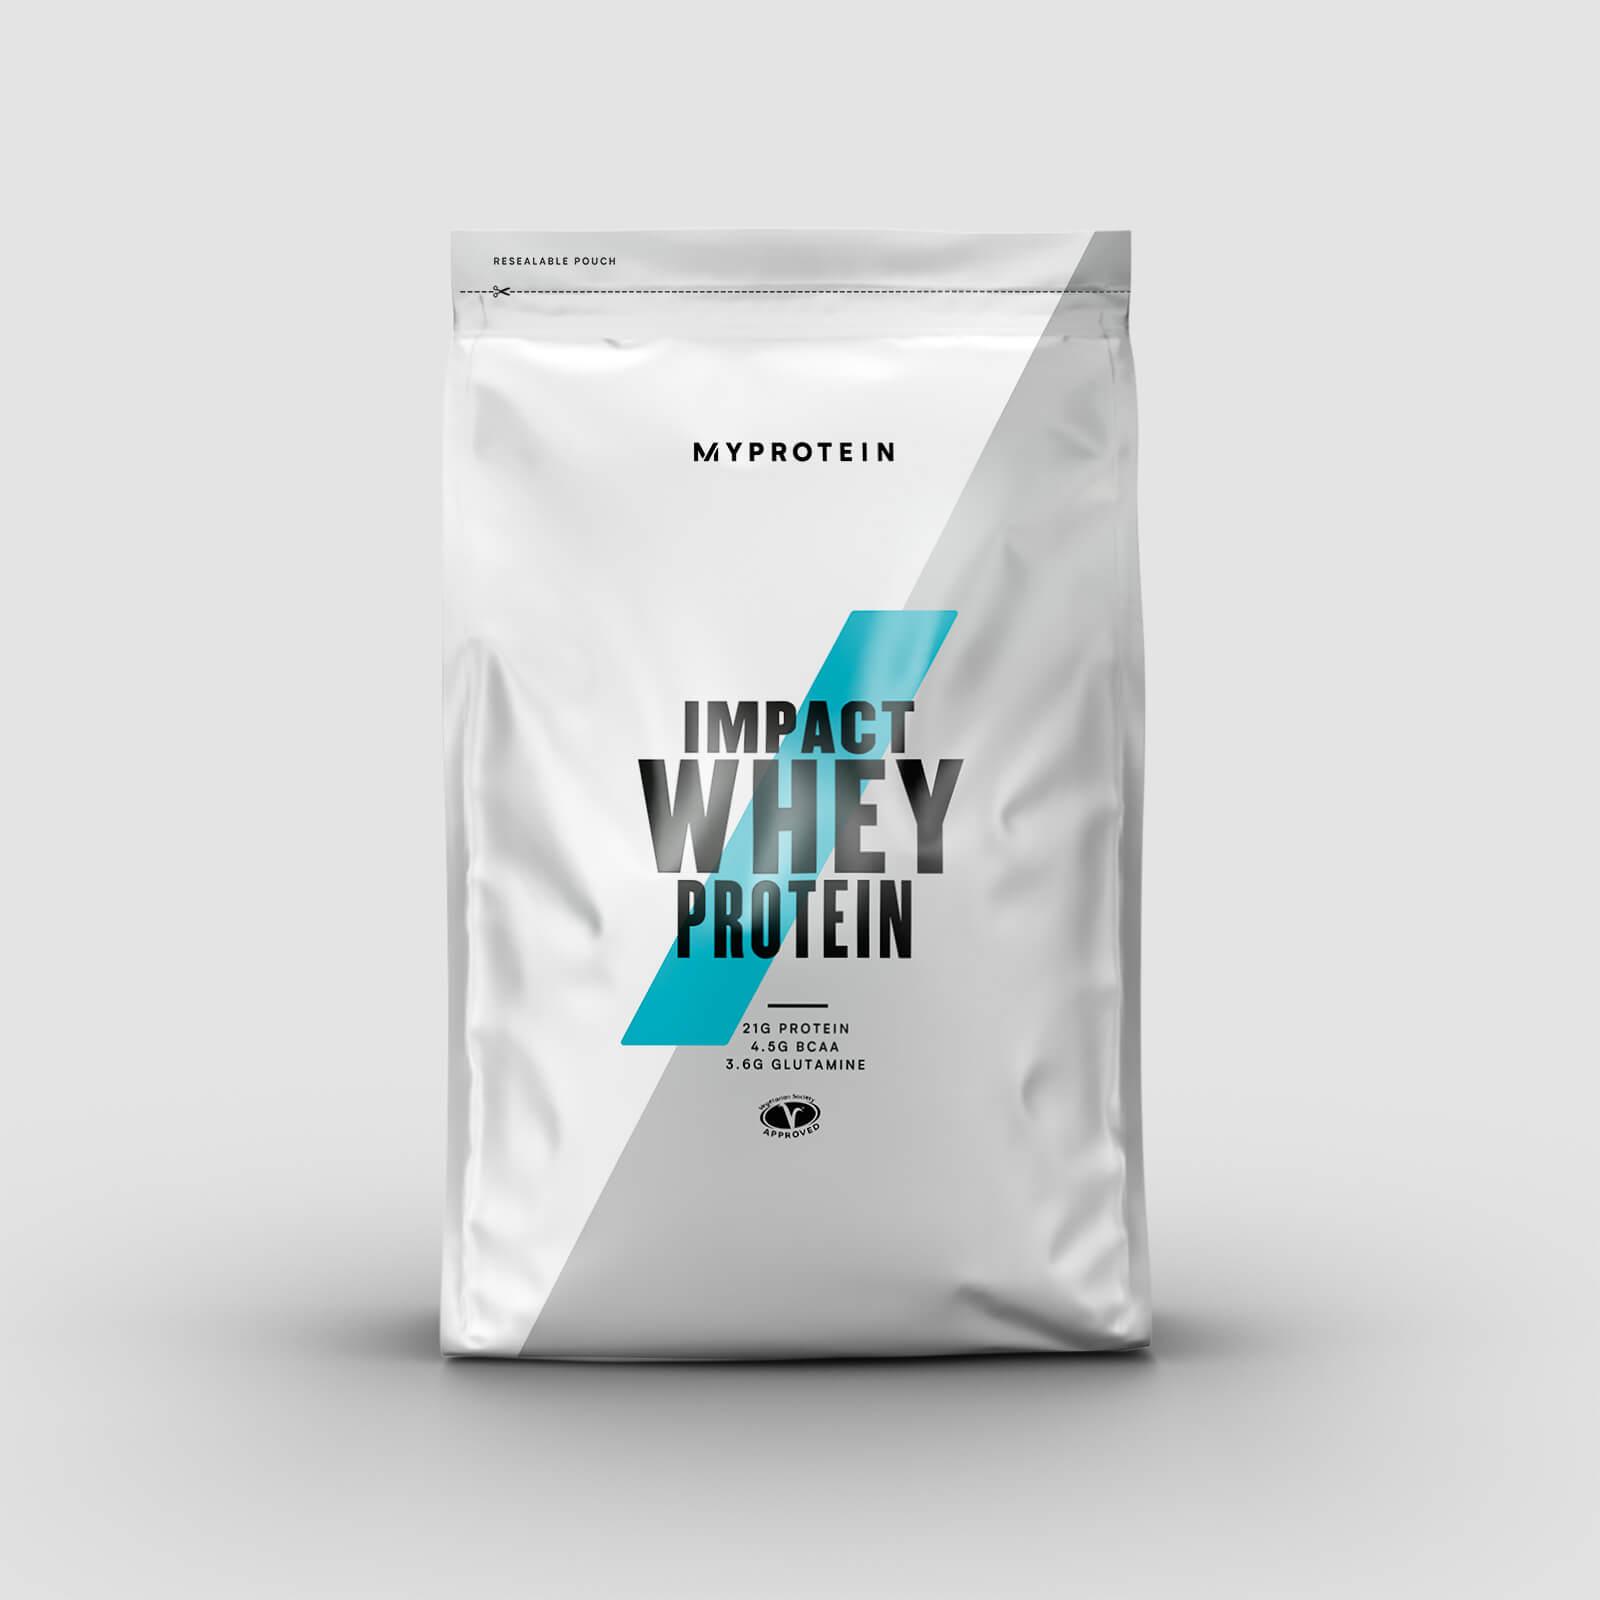 Myprotein Impact Whey Protein - 1kg - Peach Tea